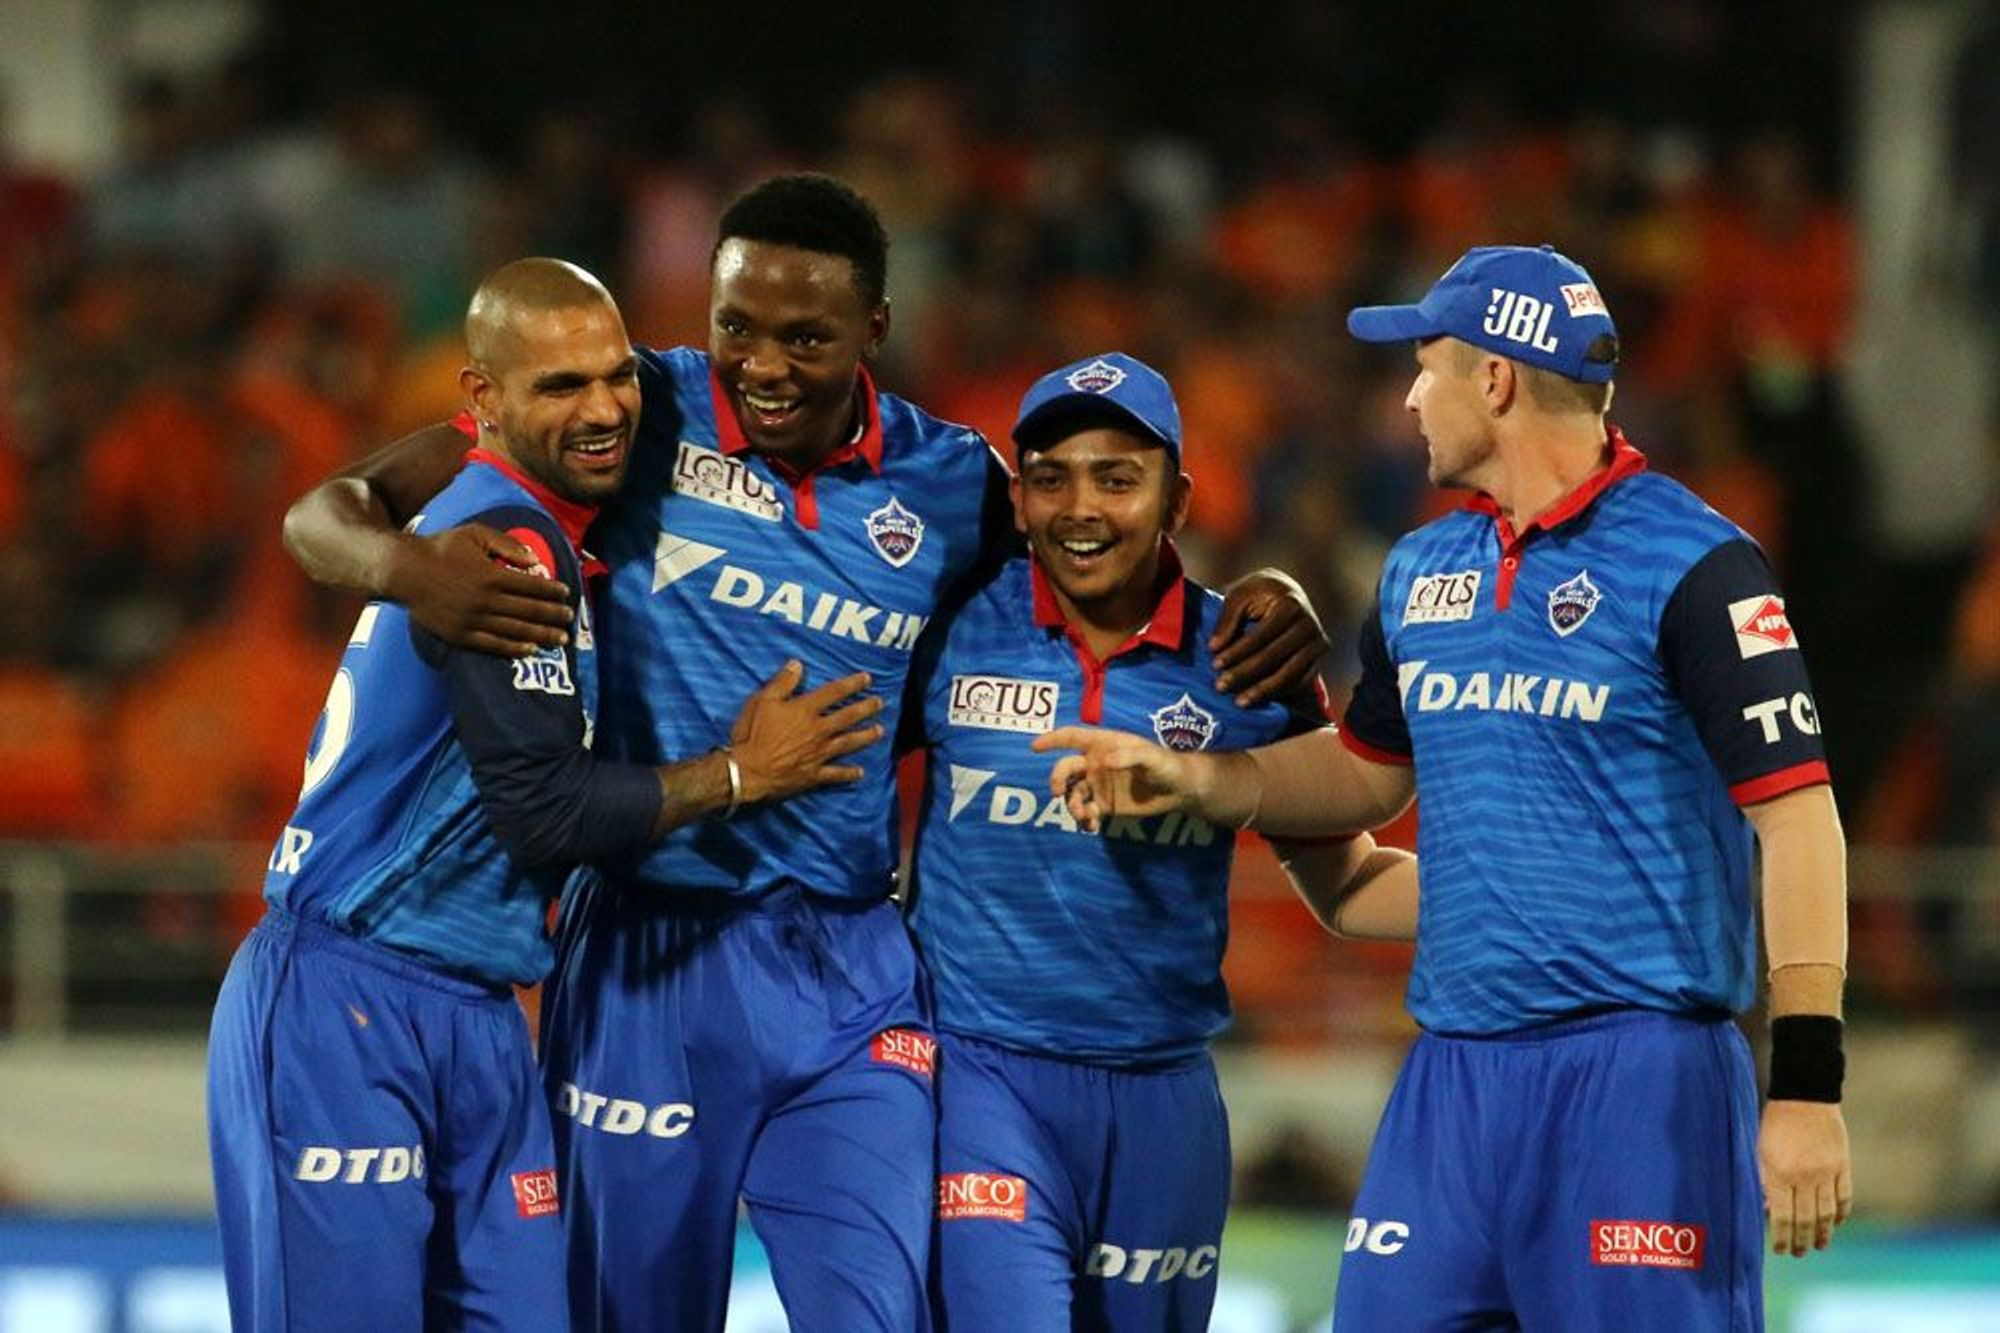 IPL, 2019, Delhi,Mumbai, Indians, Capitals, NewsMobile, Mobile, News, India, Sports, Cricket